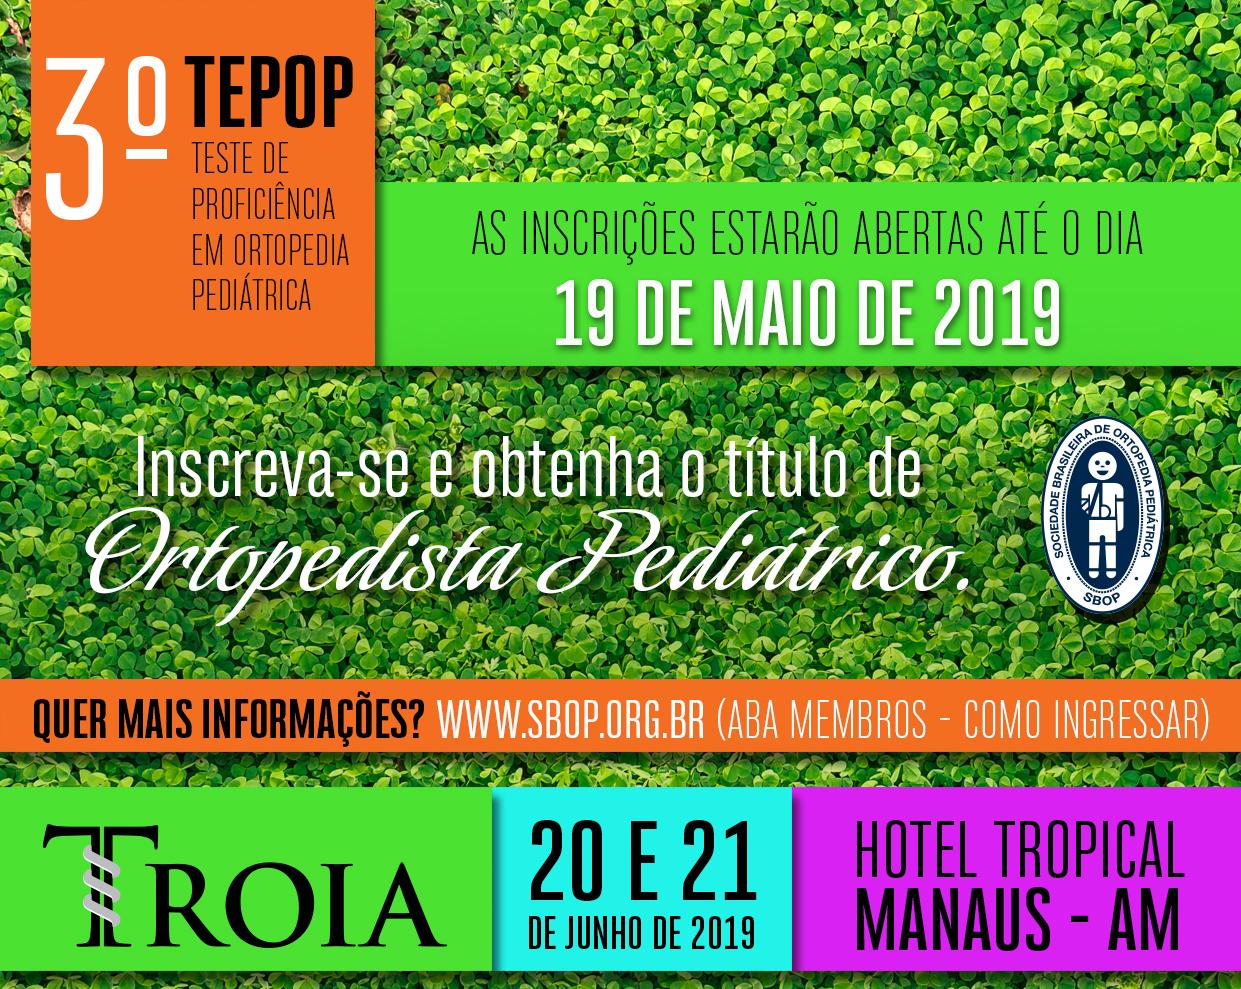 3º TEPOP